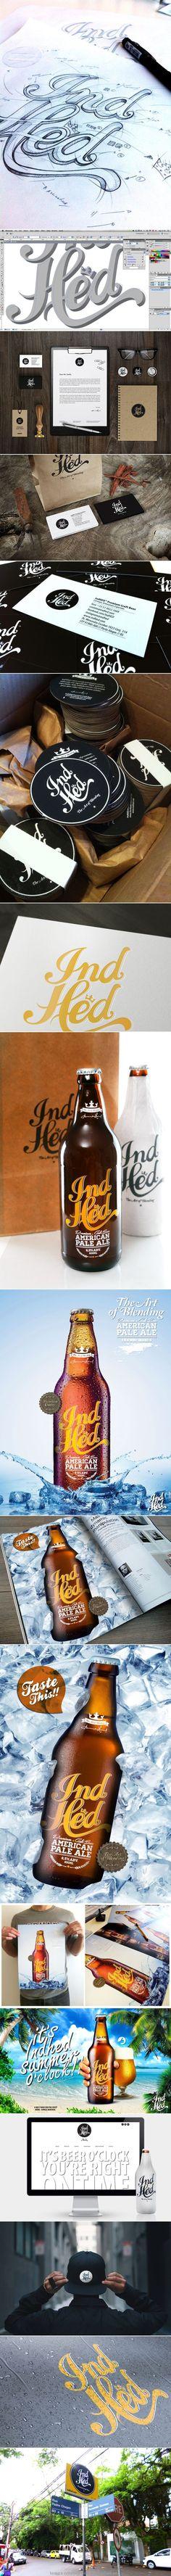 IndHed Premium Craft Beer Branding: